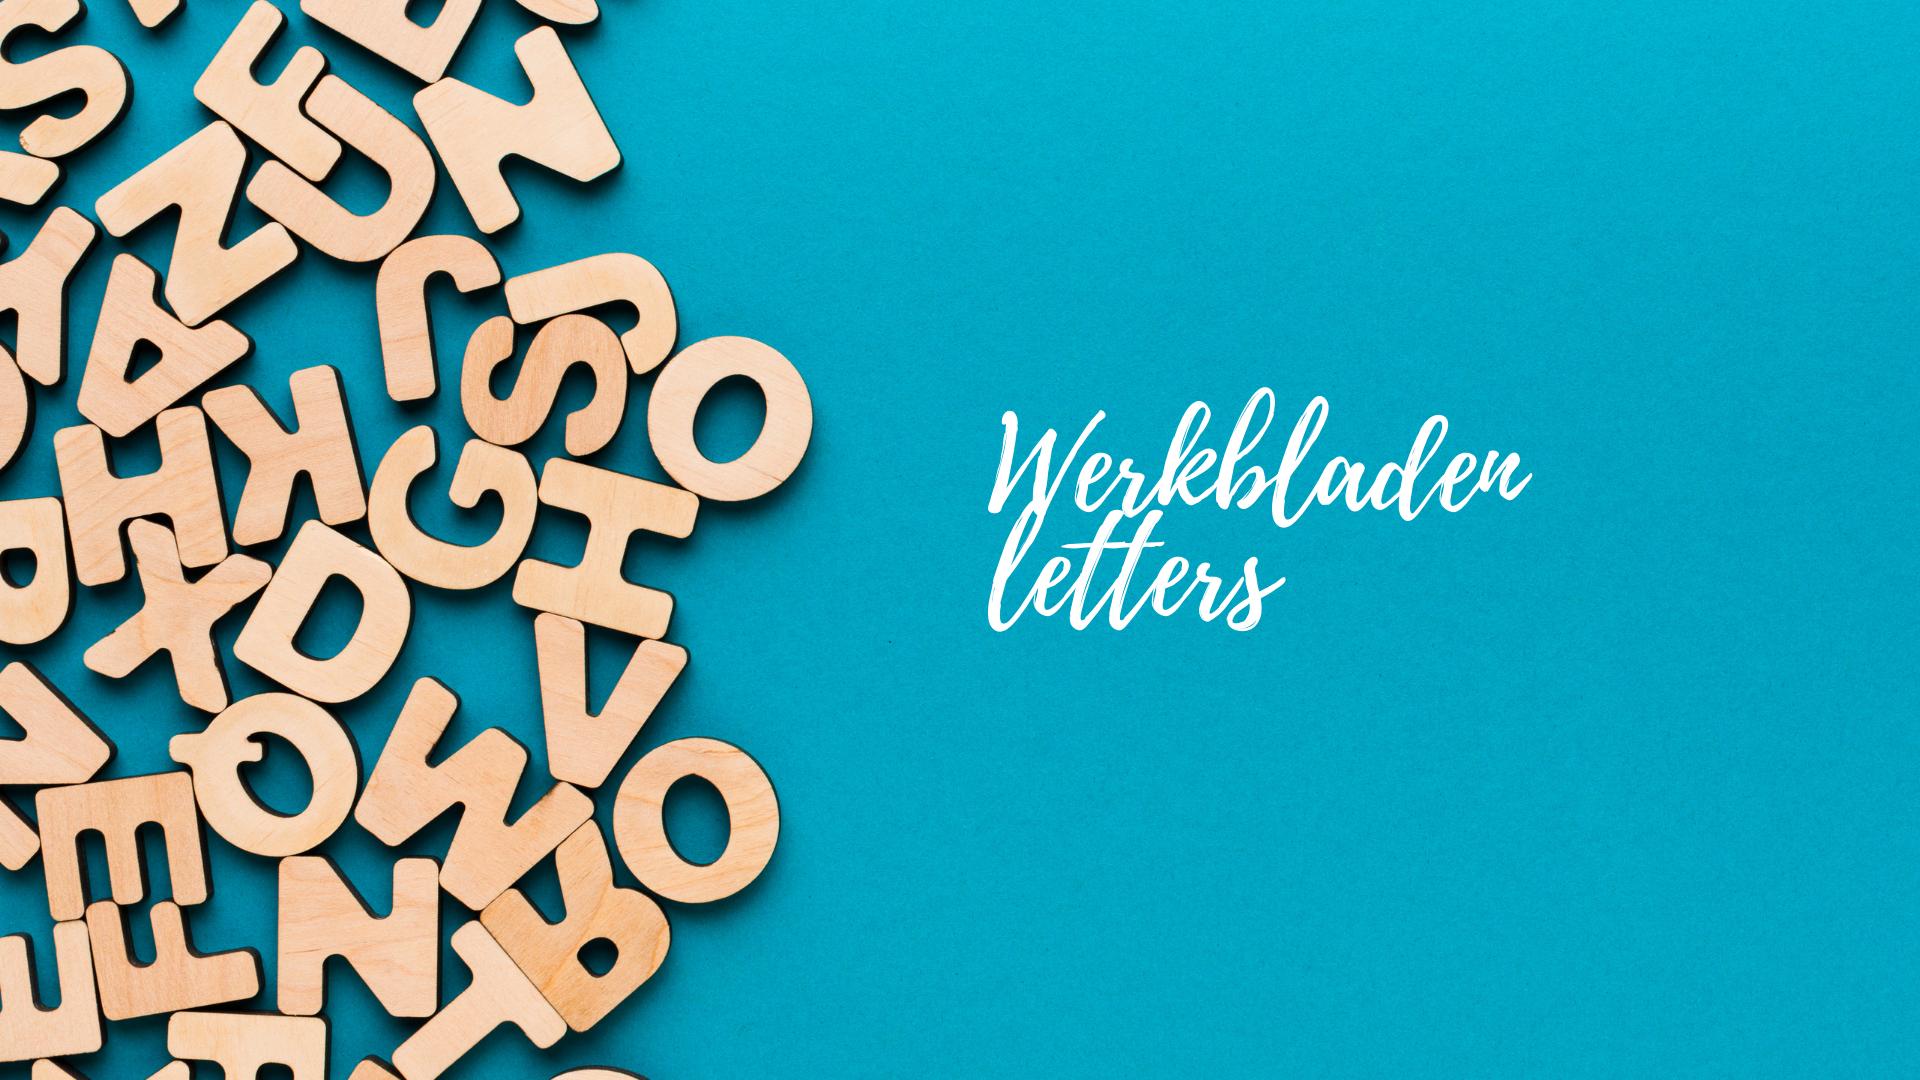 Werkbladen letters